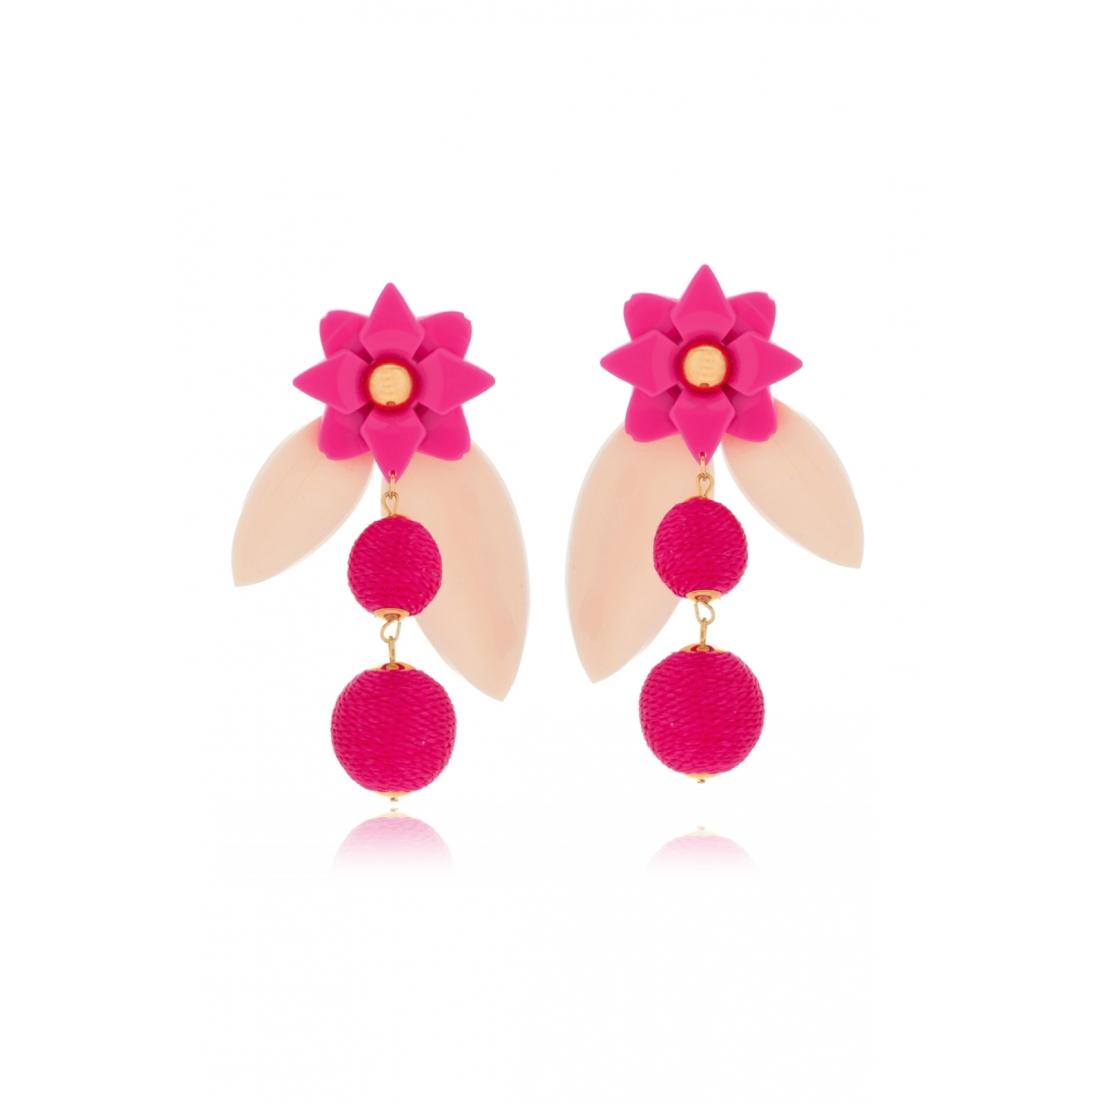 Brinco Le Diamond Flor e Esferas Rosa